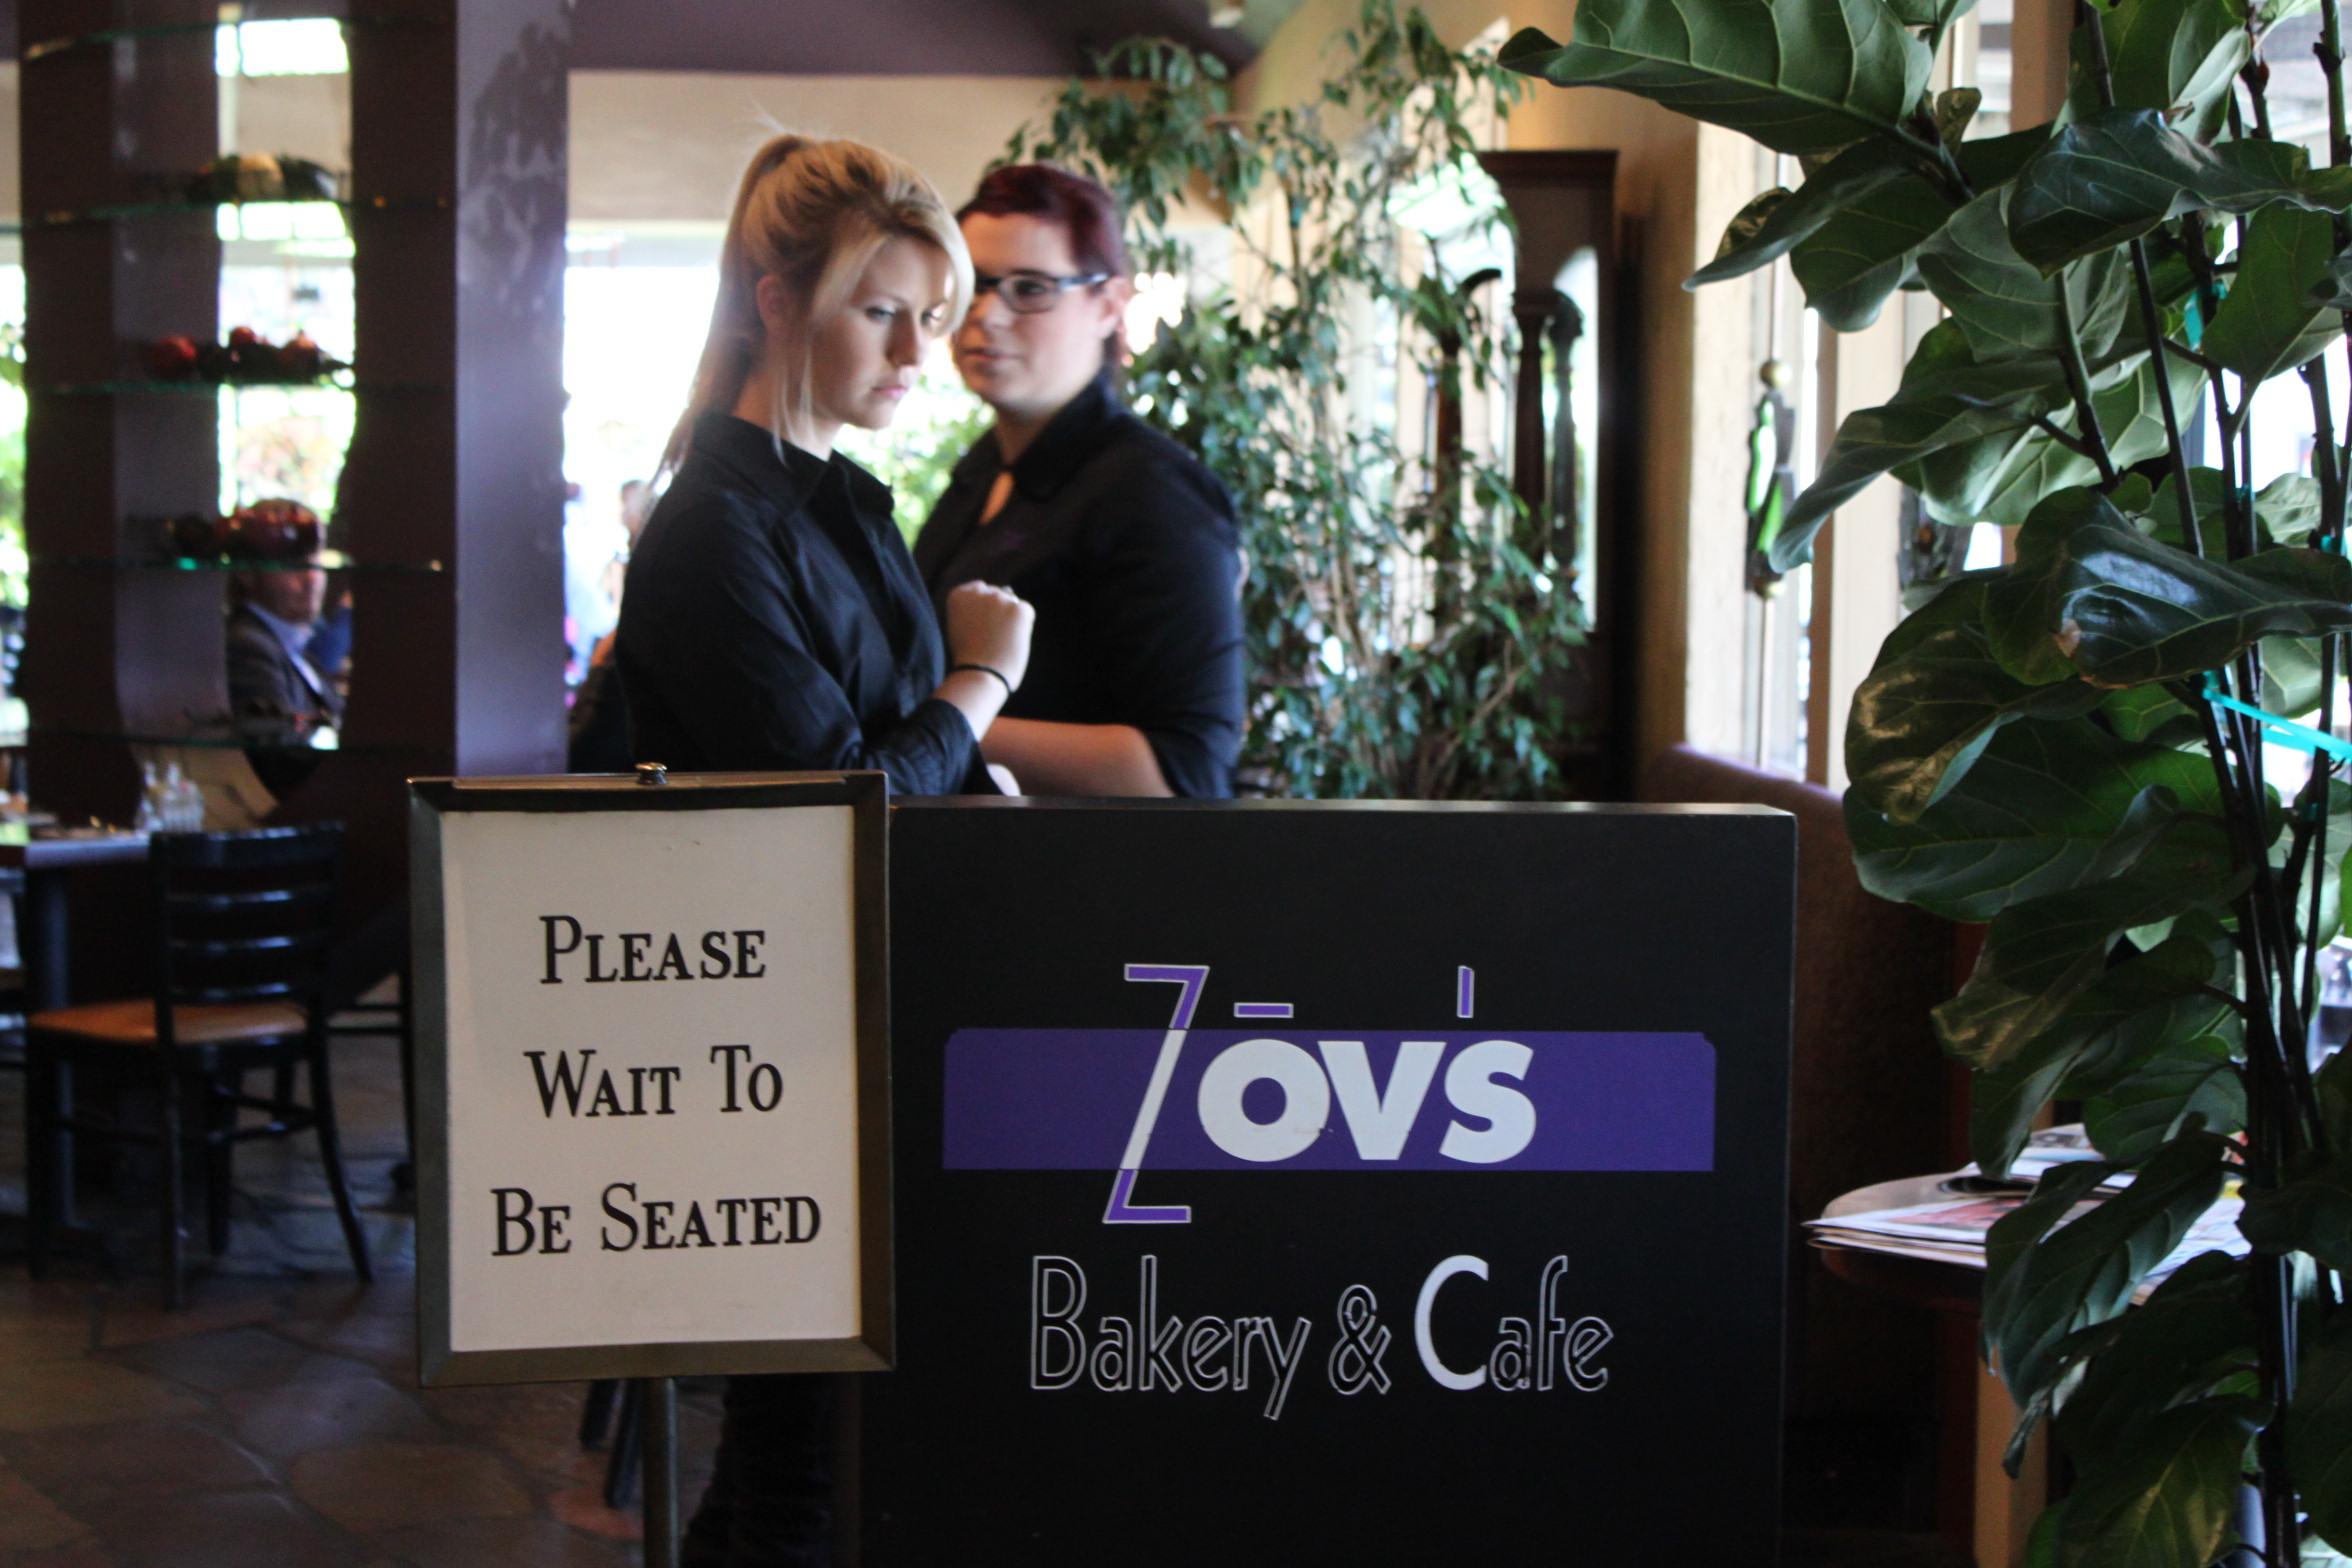 Zov's Bakery